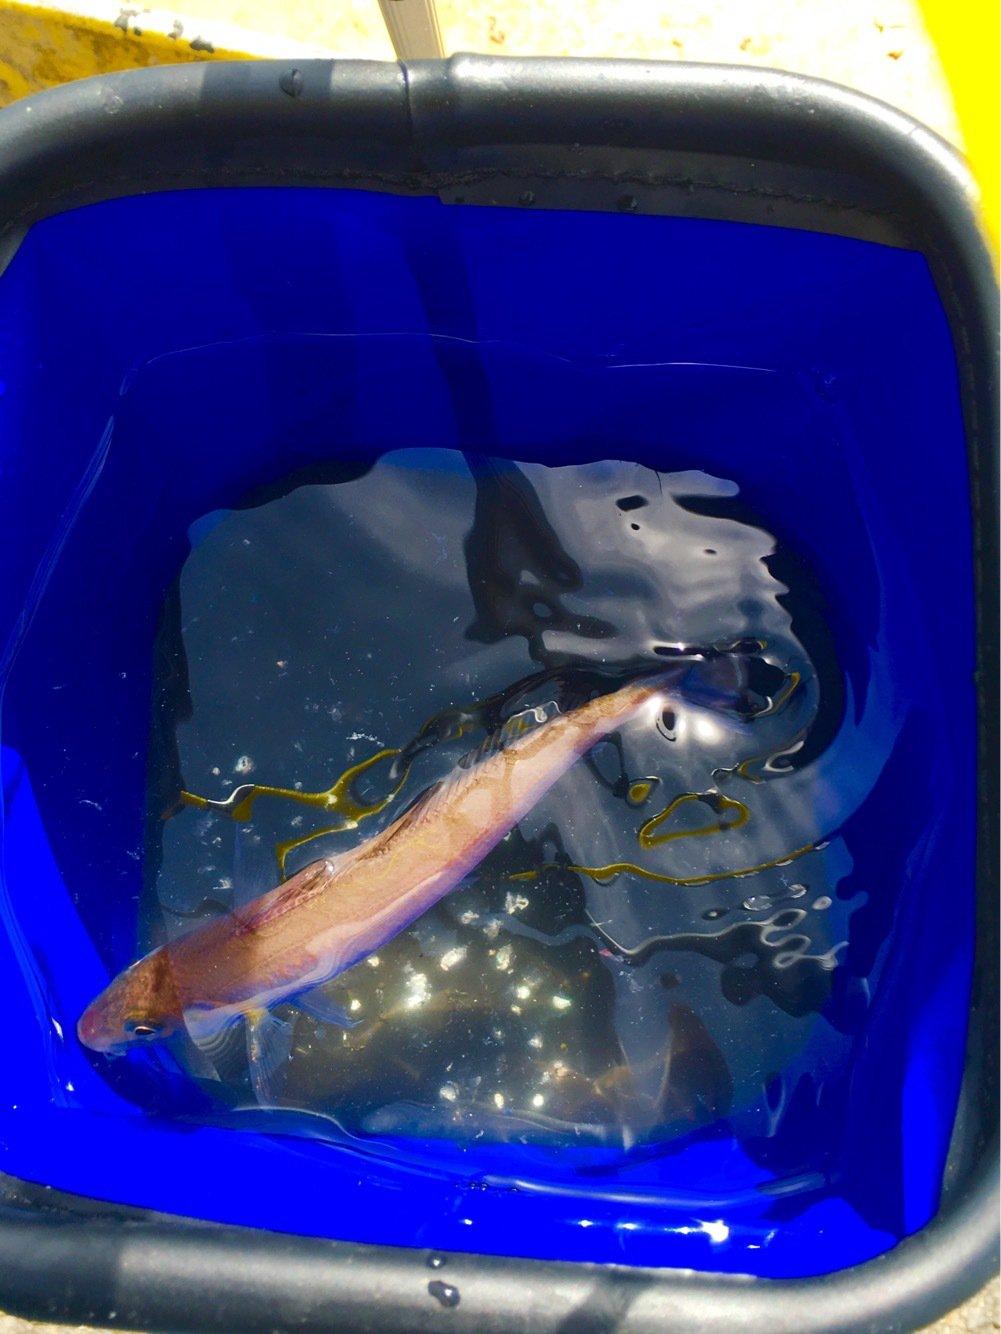 Hiroyukiさんの投稿画像,写っている魚はシロギス